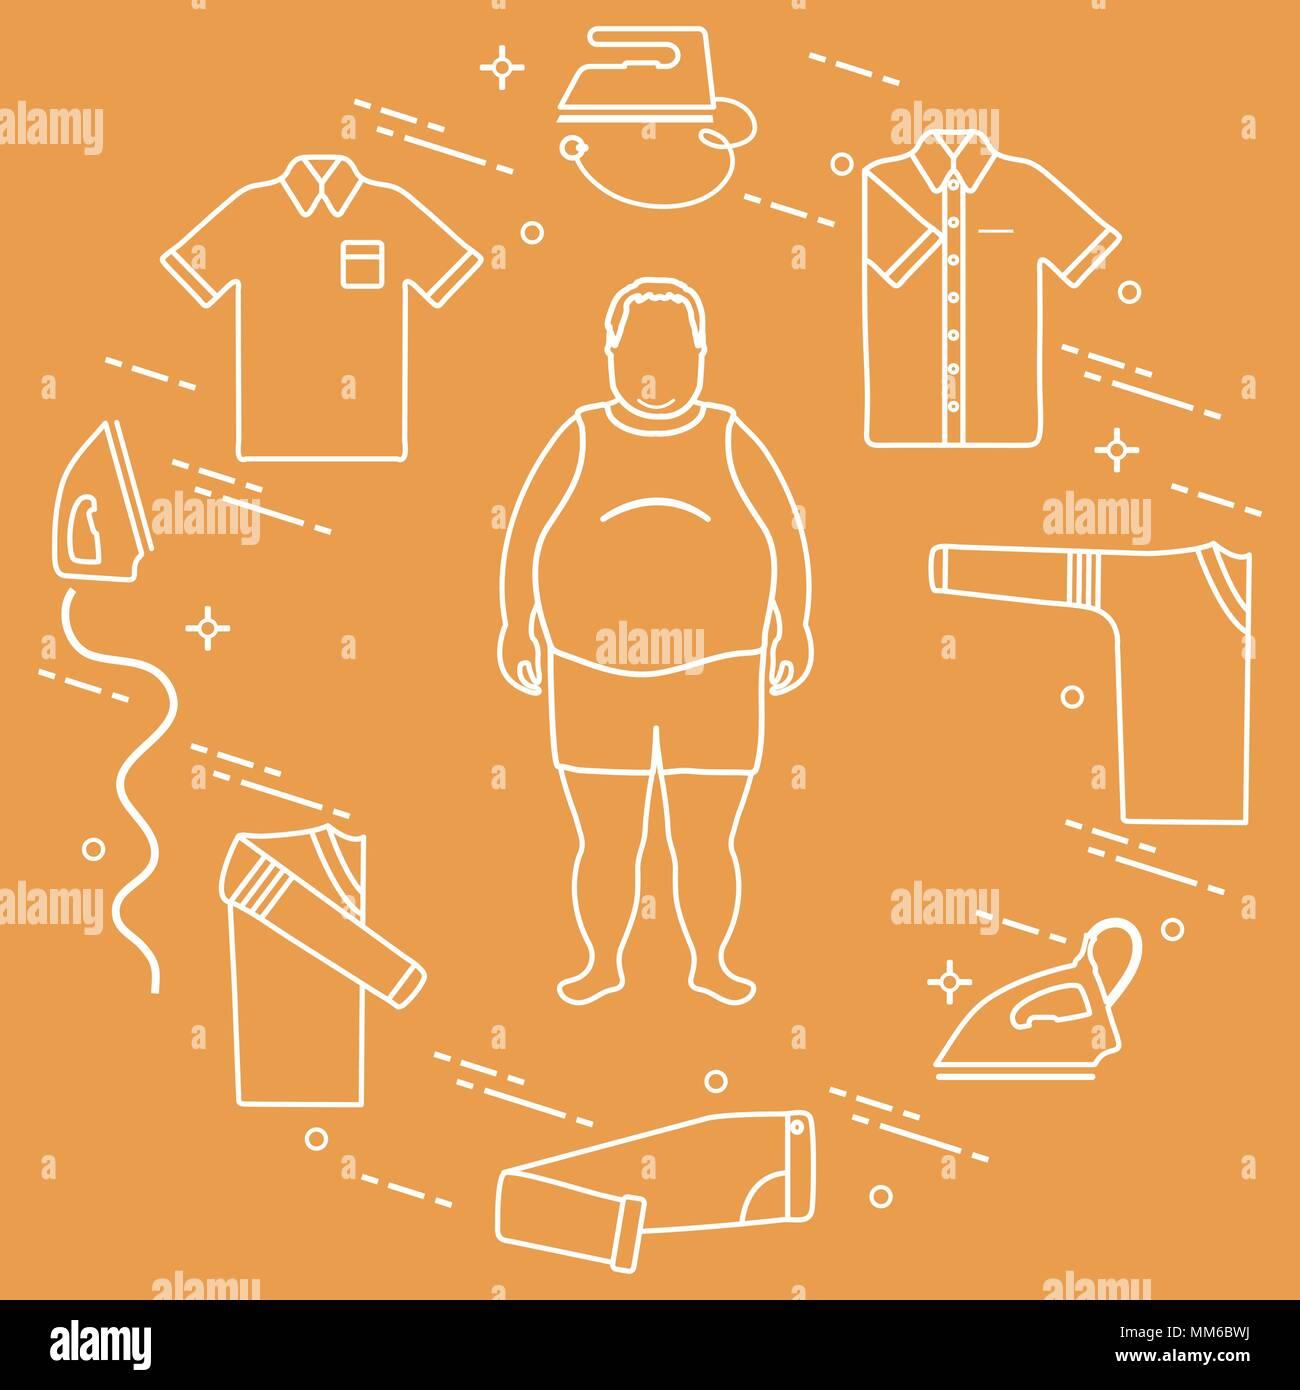 Fat Obese Overweight Stockfotos & Fat Obese Overweight Bilder ...